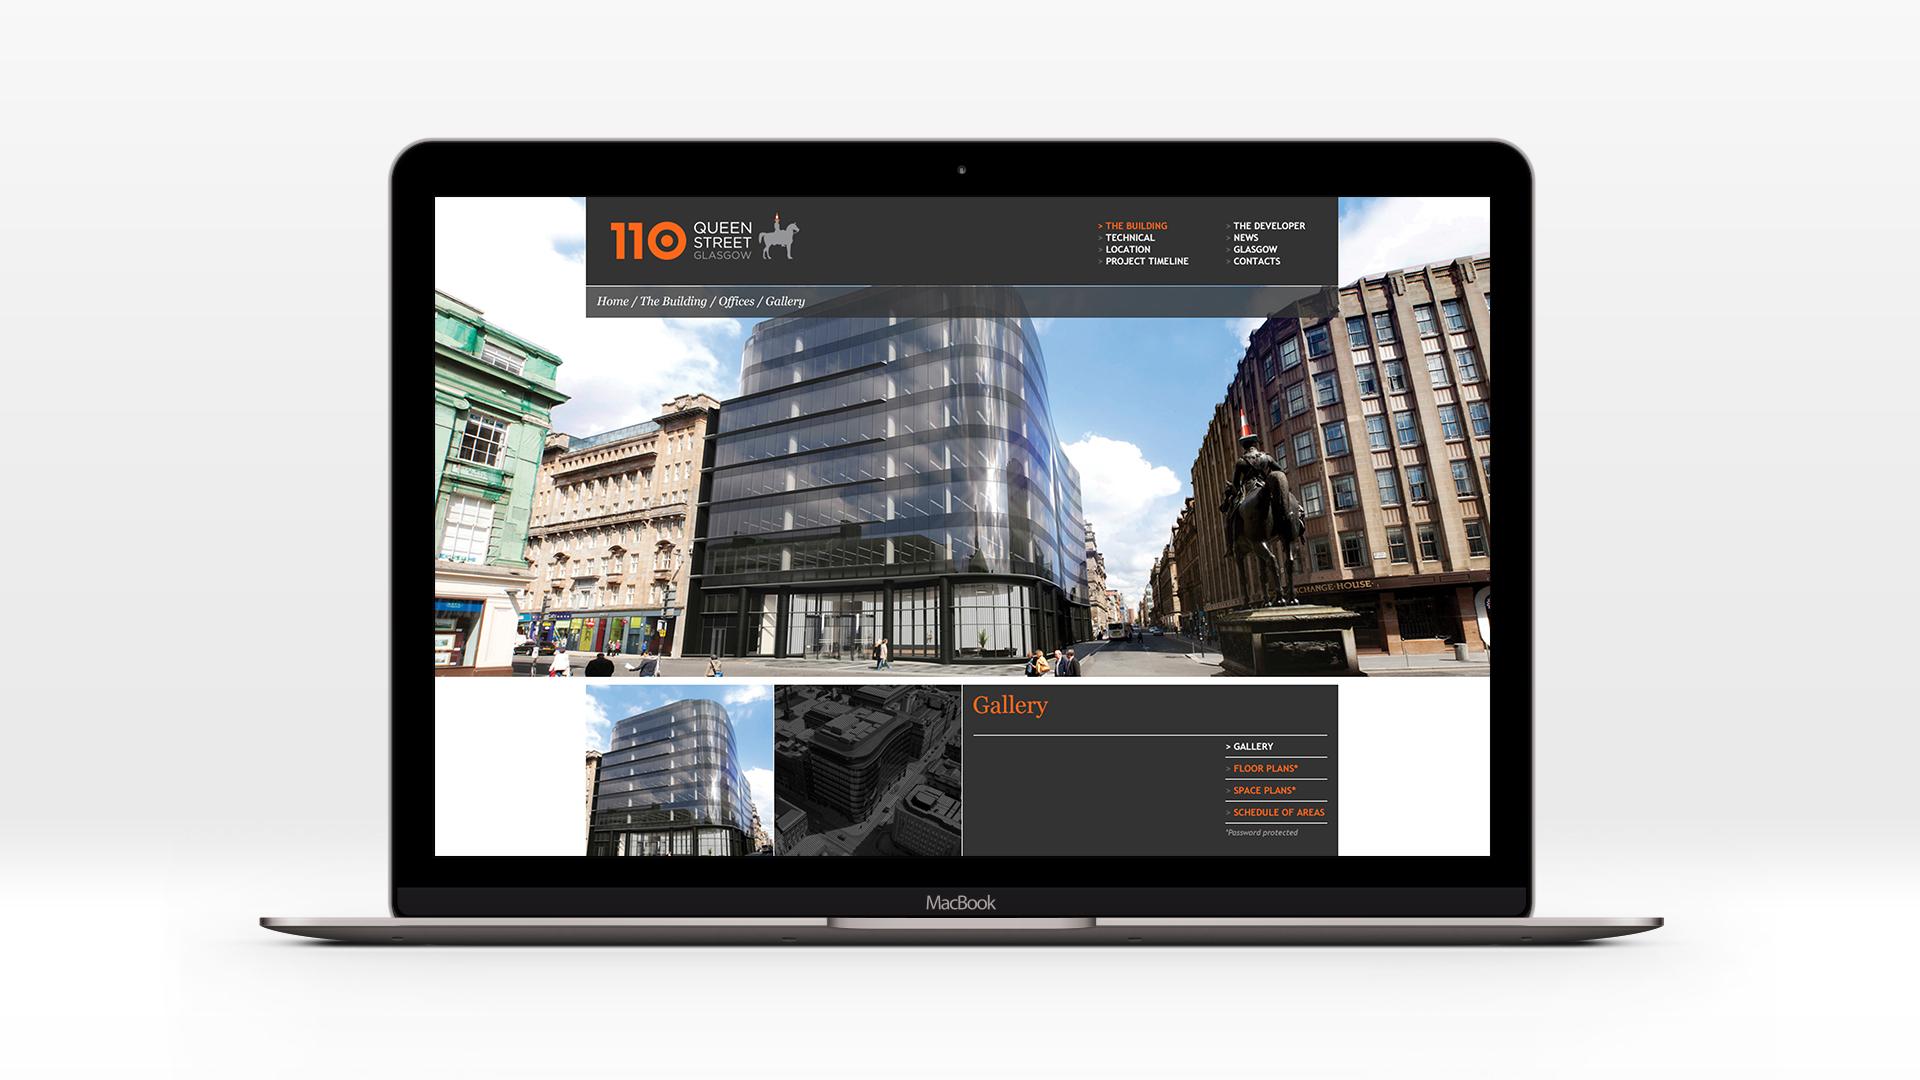 openagency_bam-brand_1920x1080_website_2